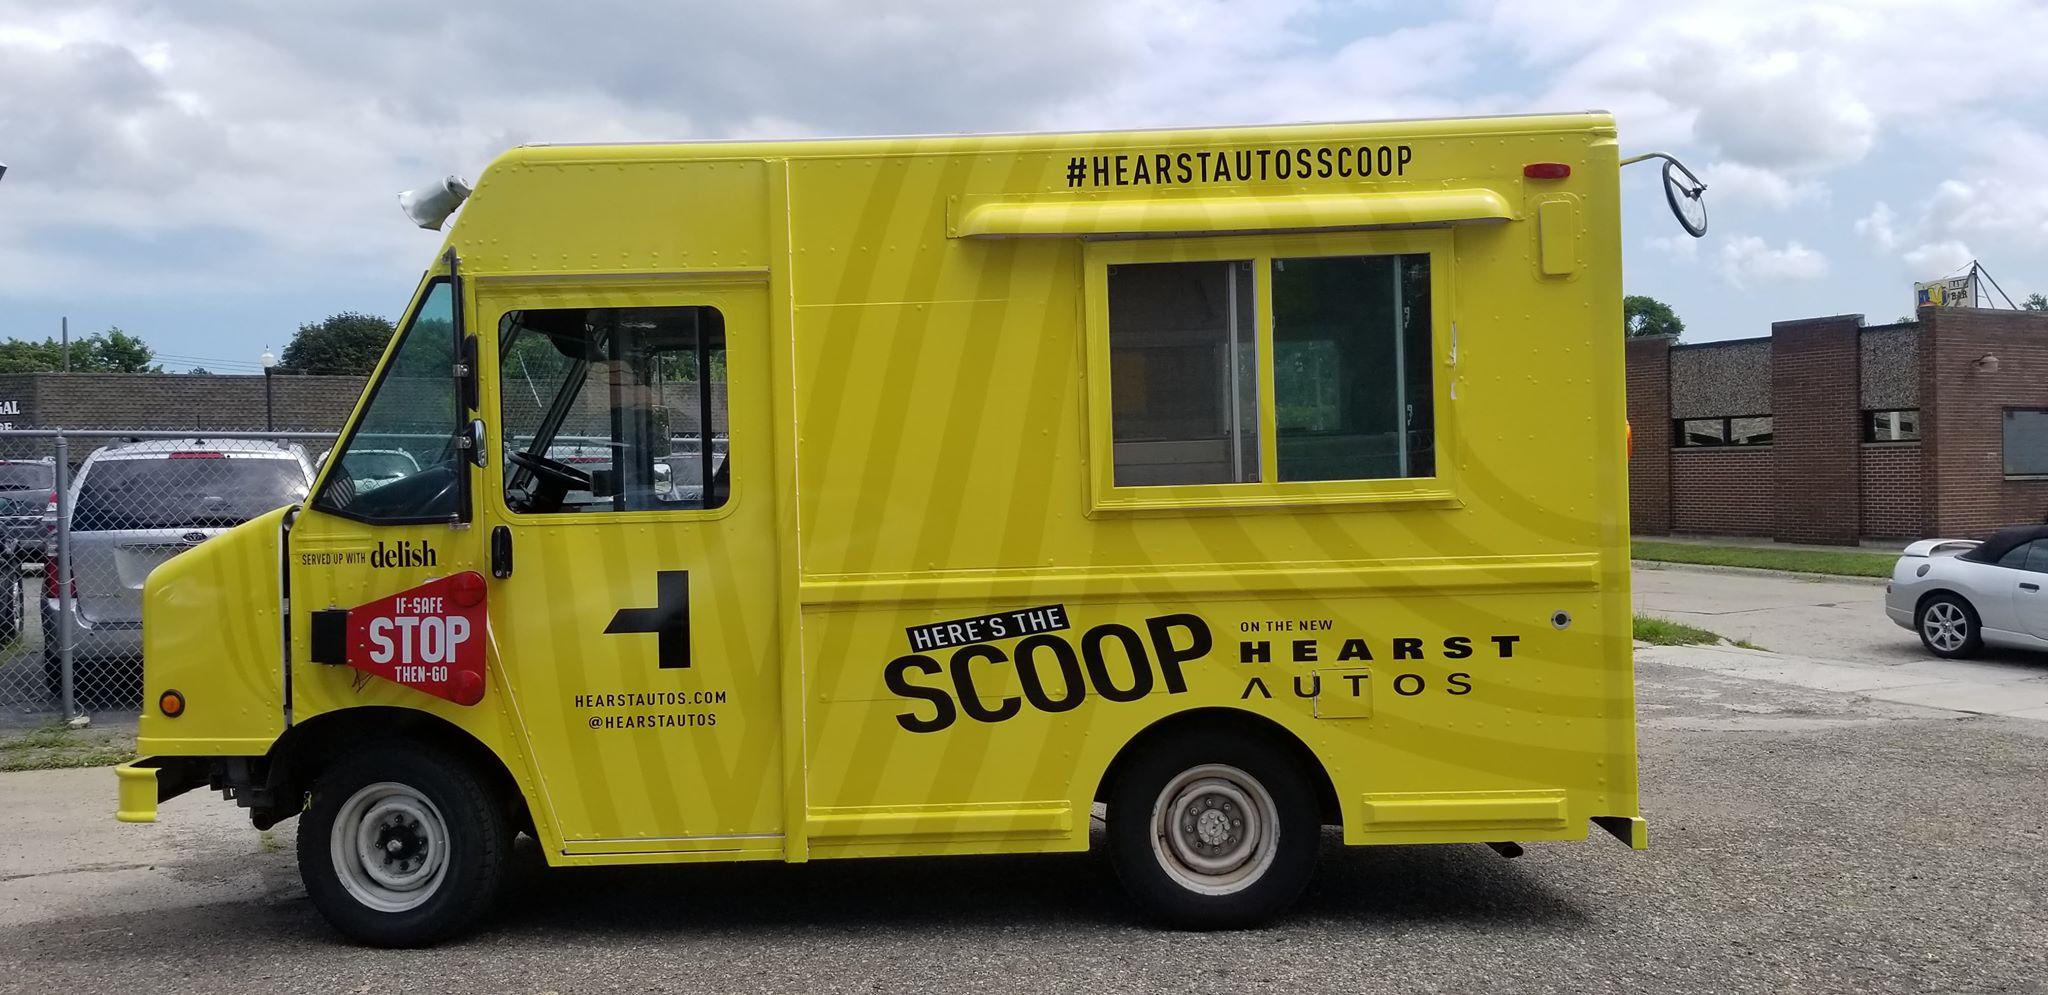 Truck & SUV Wraps - Vehicle Wraps in Detroit, MI | Vinyl ...